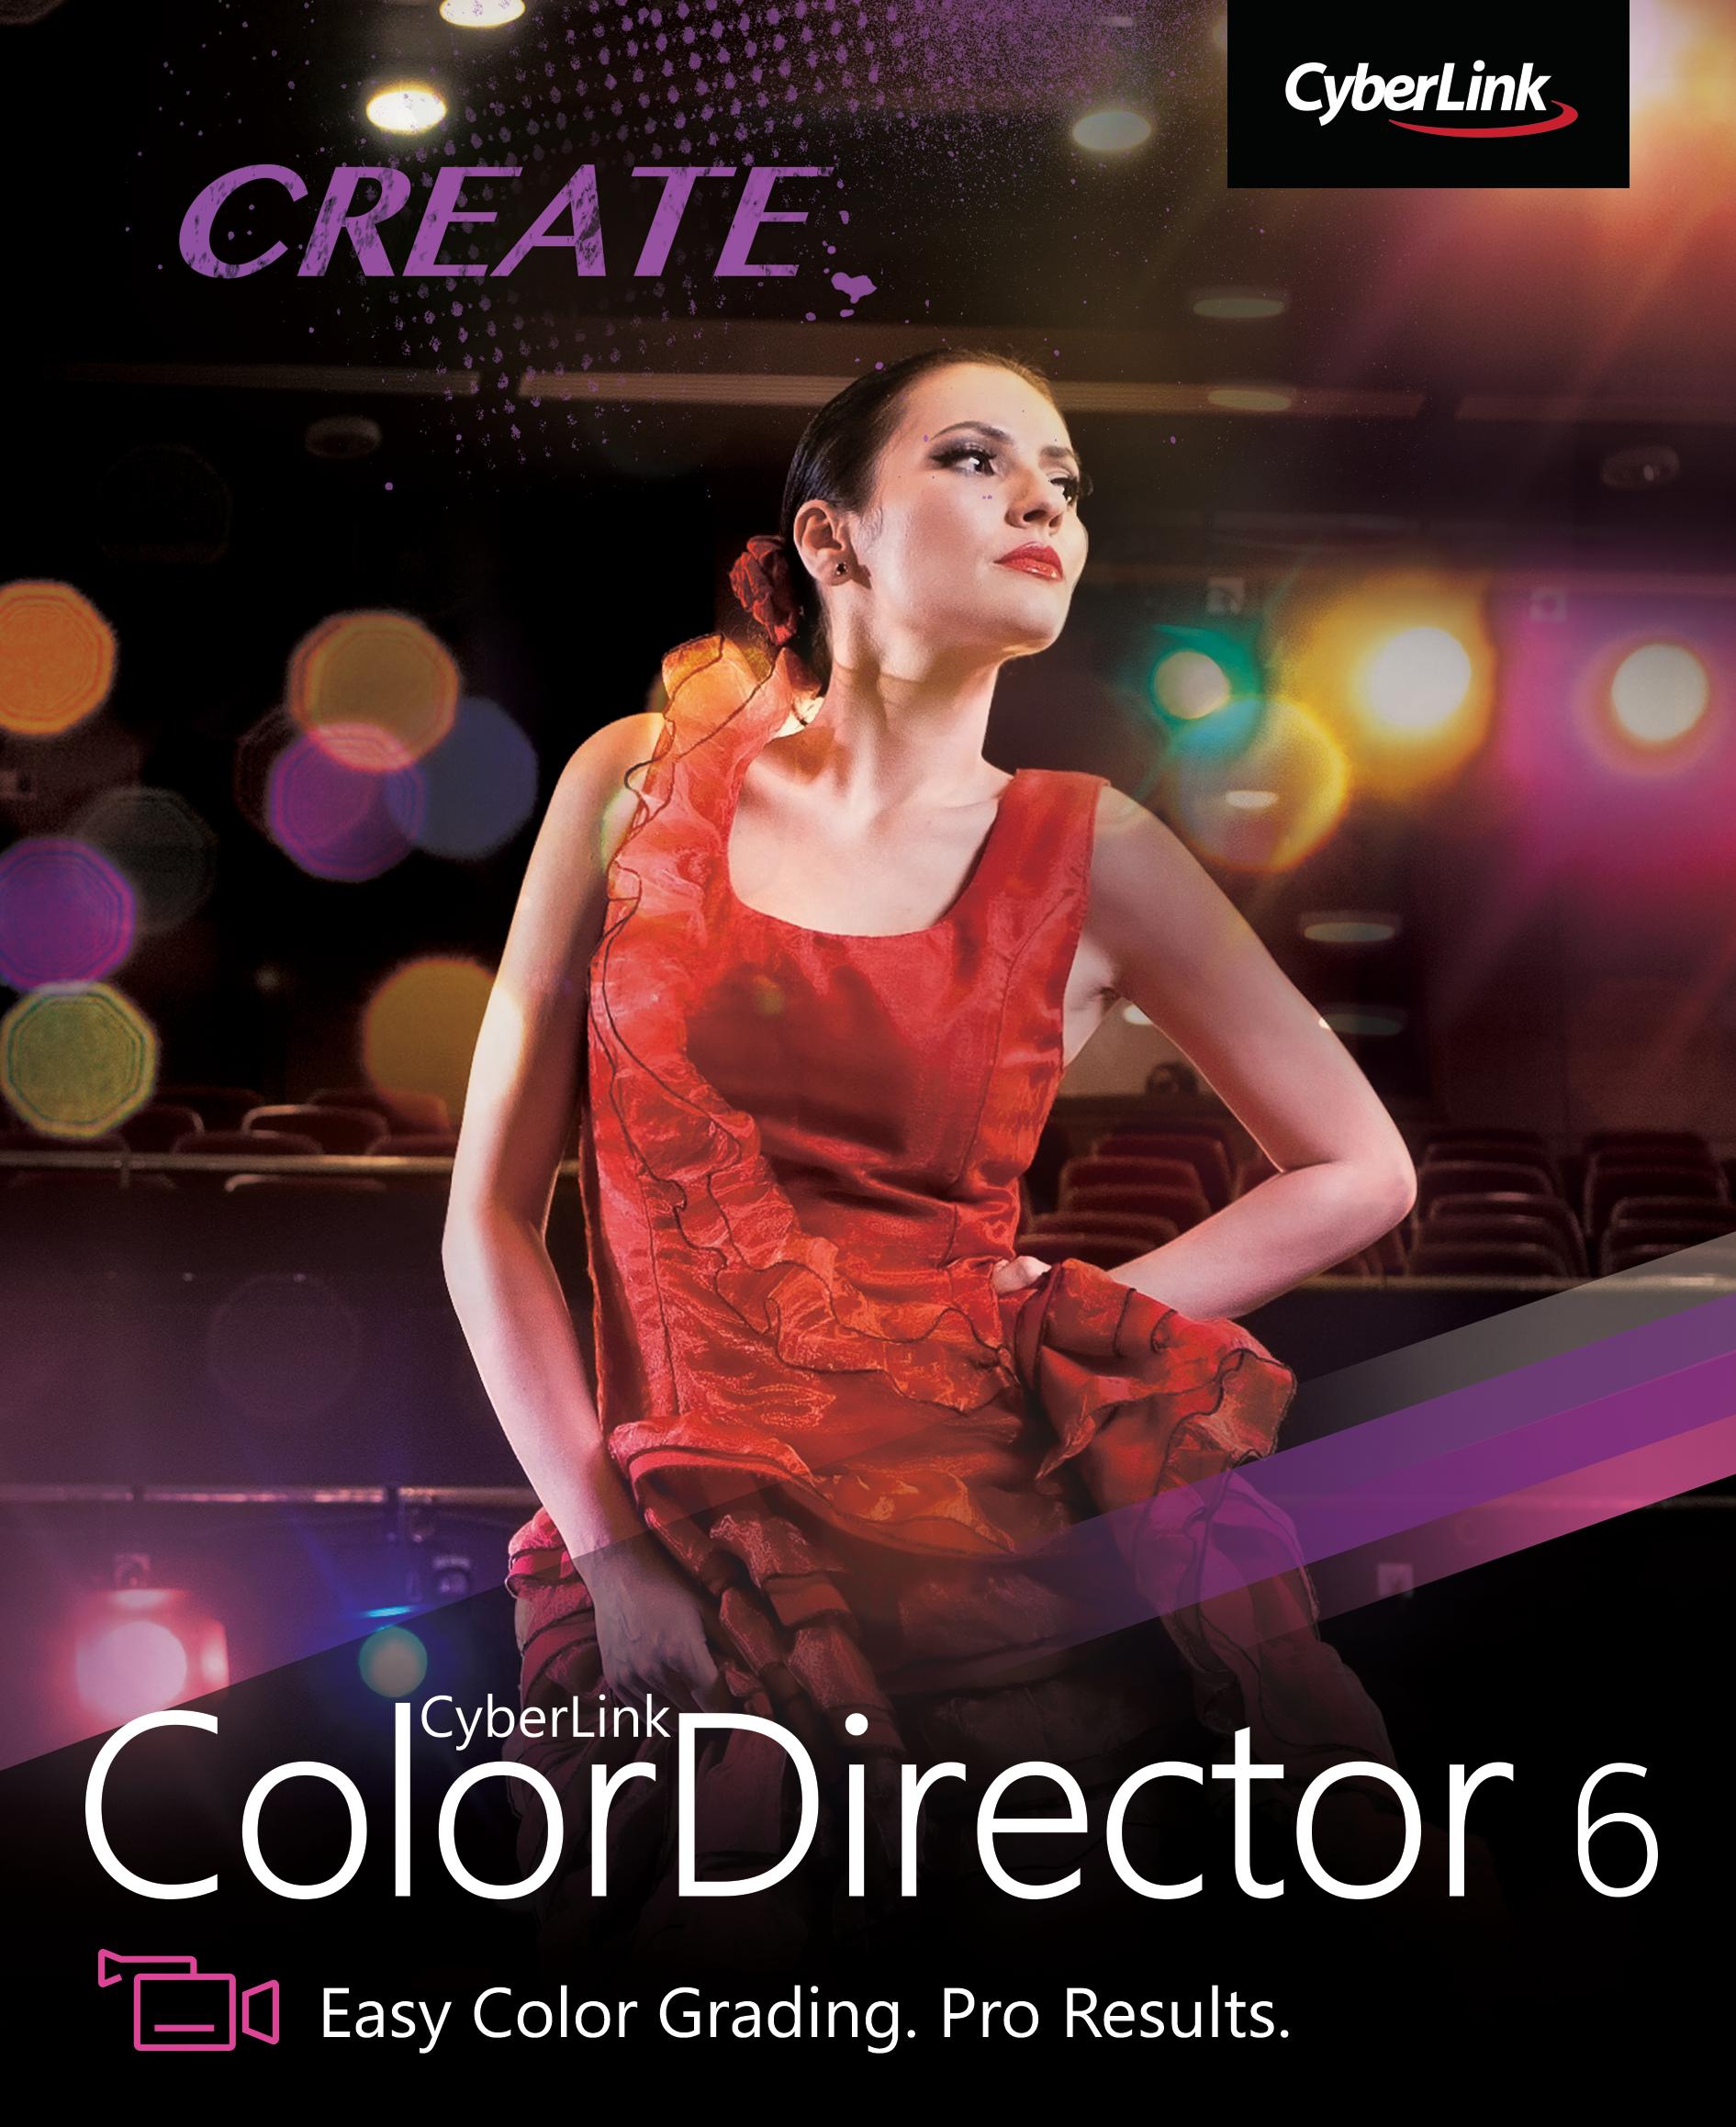 CyberLink ColorDirector 6 [Download]